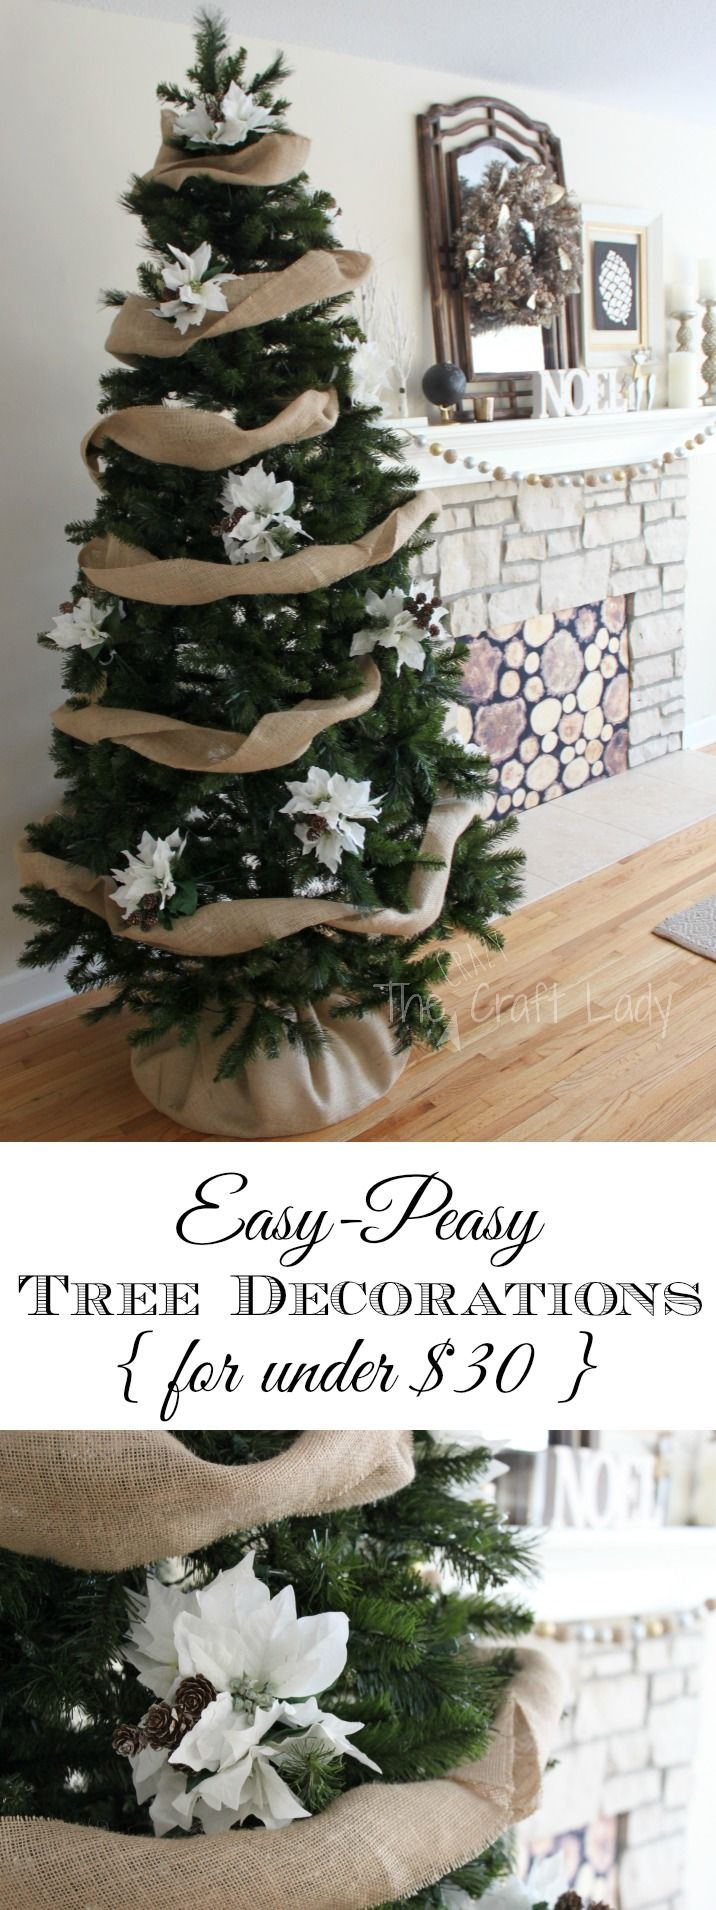 Hometalk diy christmas window decoration - Easy Diy Christmas Tree Decorations For Under 30